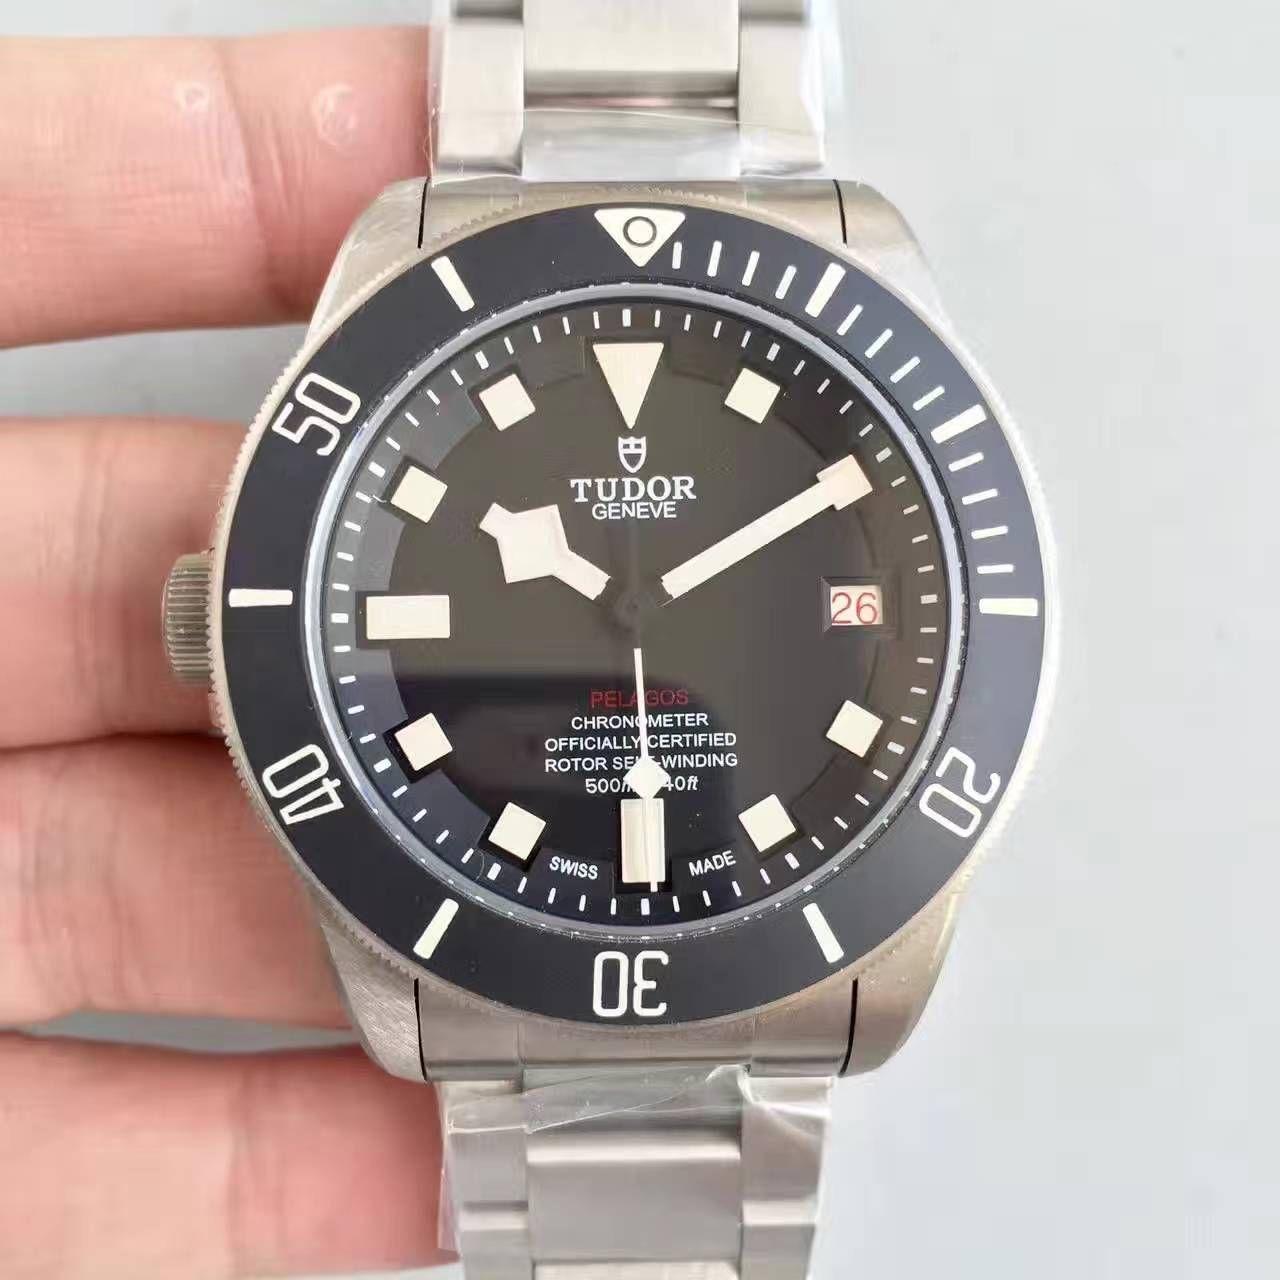 【ZF厂一比一复刻手表】帝舵反手左撇子25610TNL全新领潜型LHD左撇子腕表 / DT027